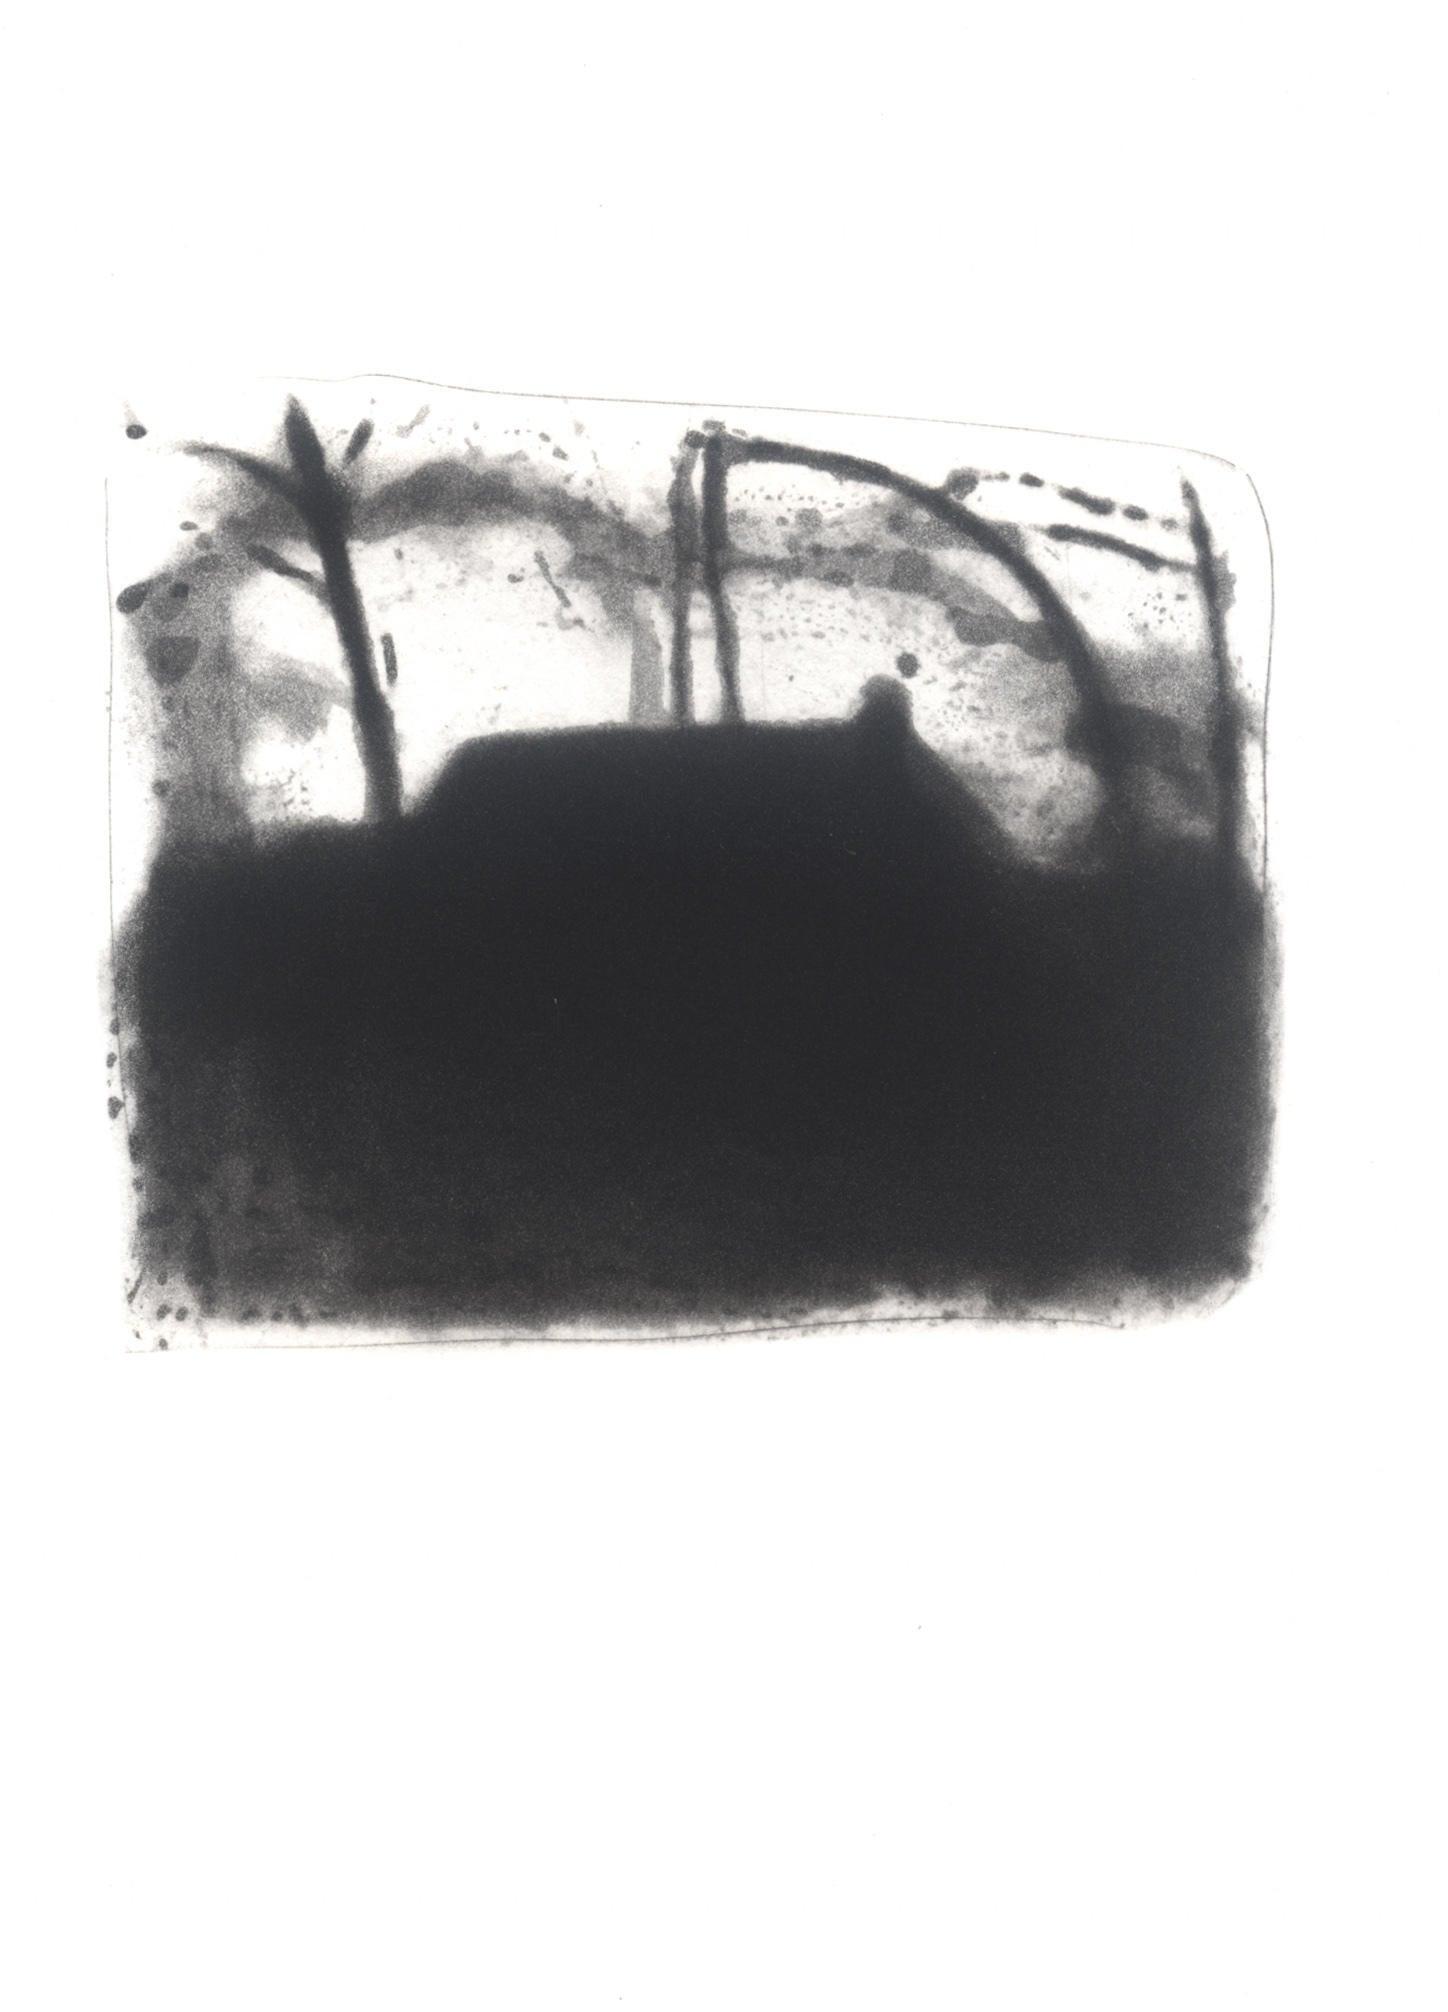 VI. Dusk image